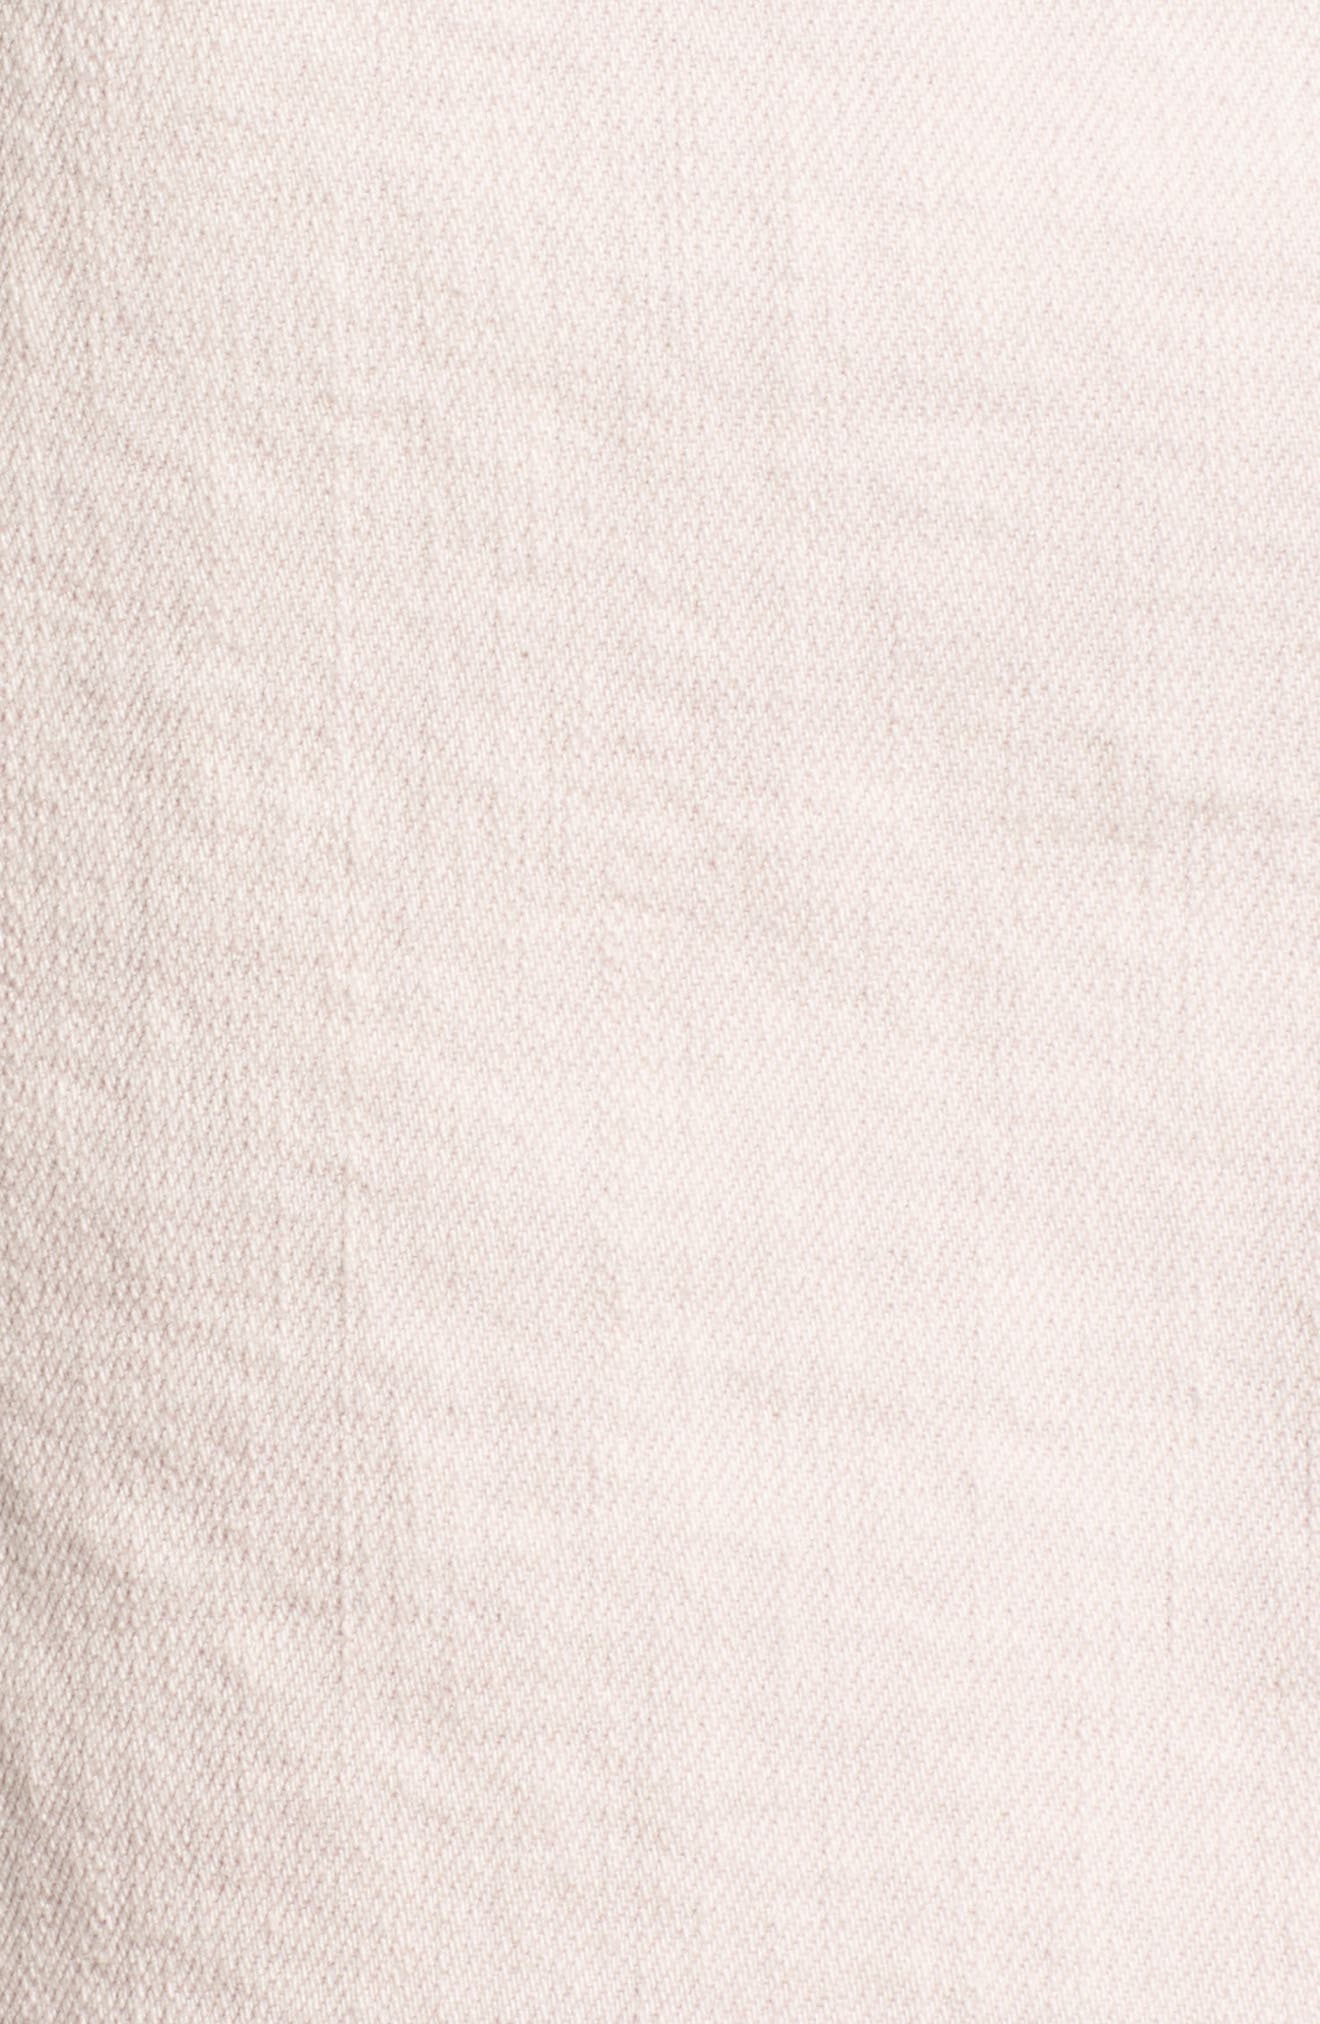 The Vagabond Cutoff Denim Miniskirt,                             Alternate thumbnail 5, color,                             651